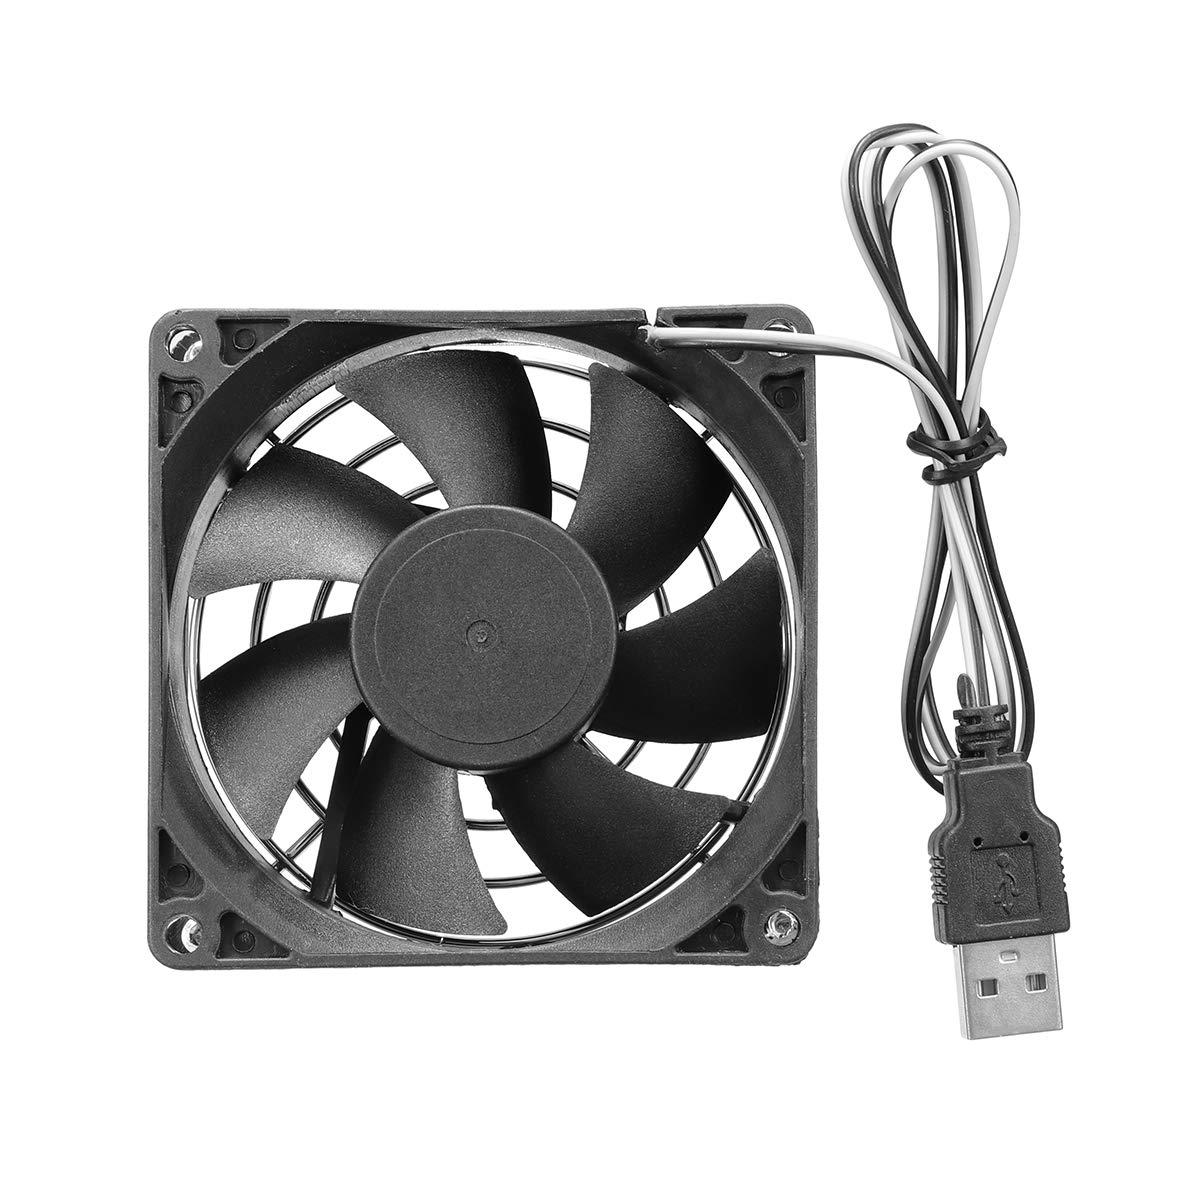 PANGUN 8Cm USB De Refrigeraci/ón Disipador T/érmico del Ventilador para Pc Ordenador TV Box para Xbox Playstation Electr/ónica